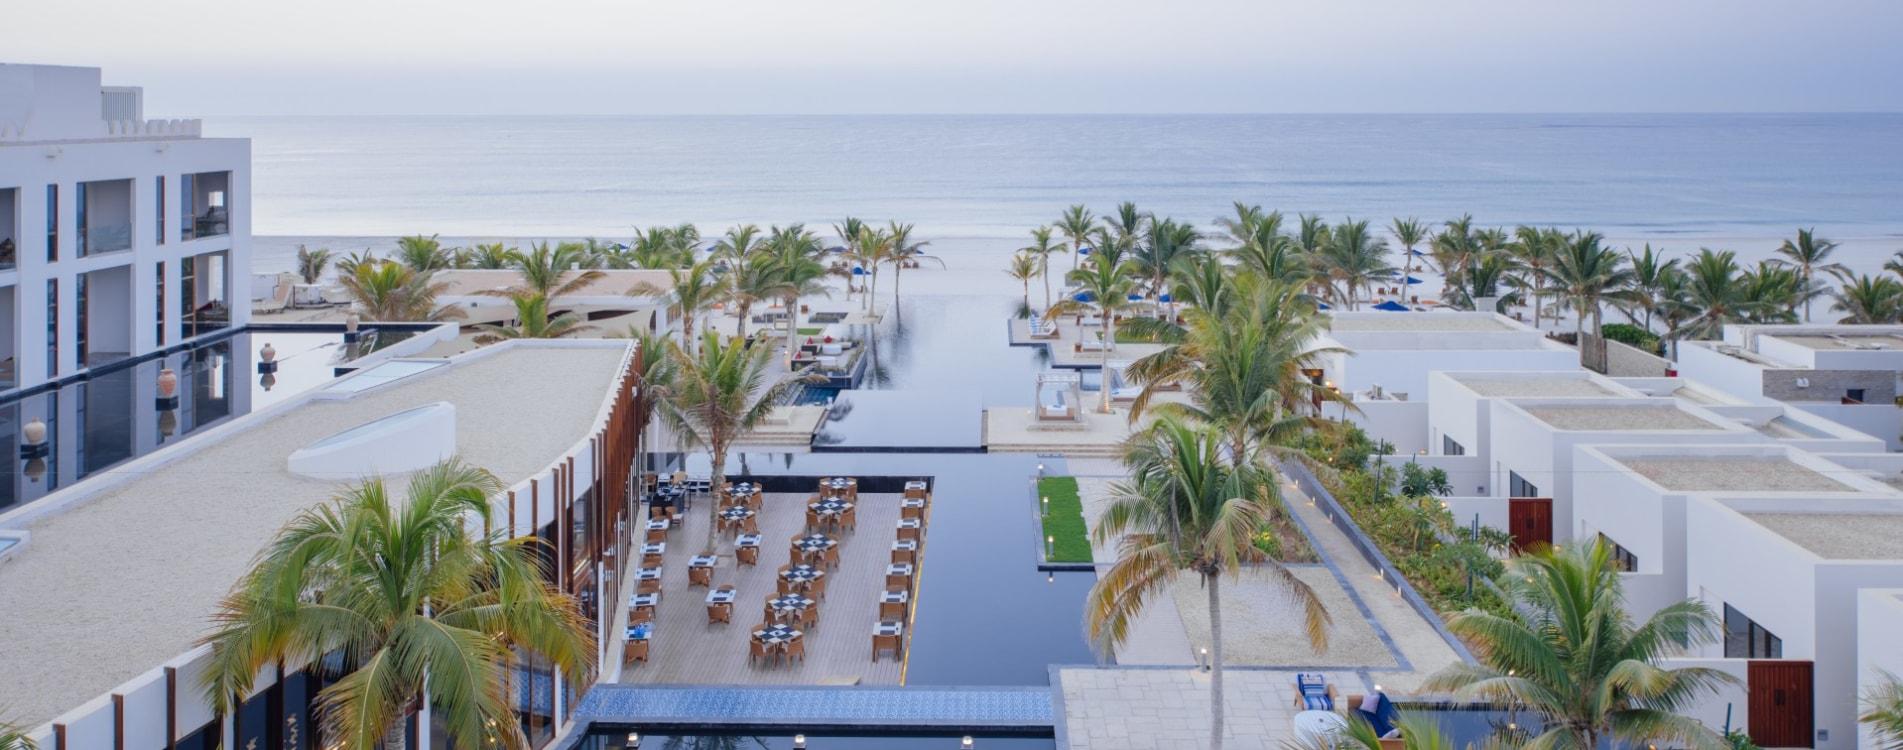 Al-Baleed-Resort-Salalah-By-Anantara-Pool-Anlage-Luftbildaufnahme-Oman.jpg